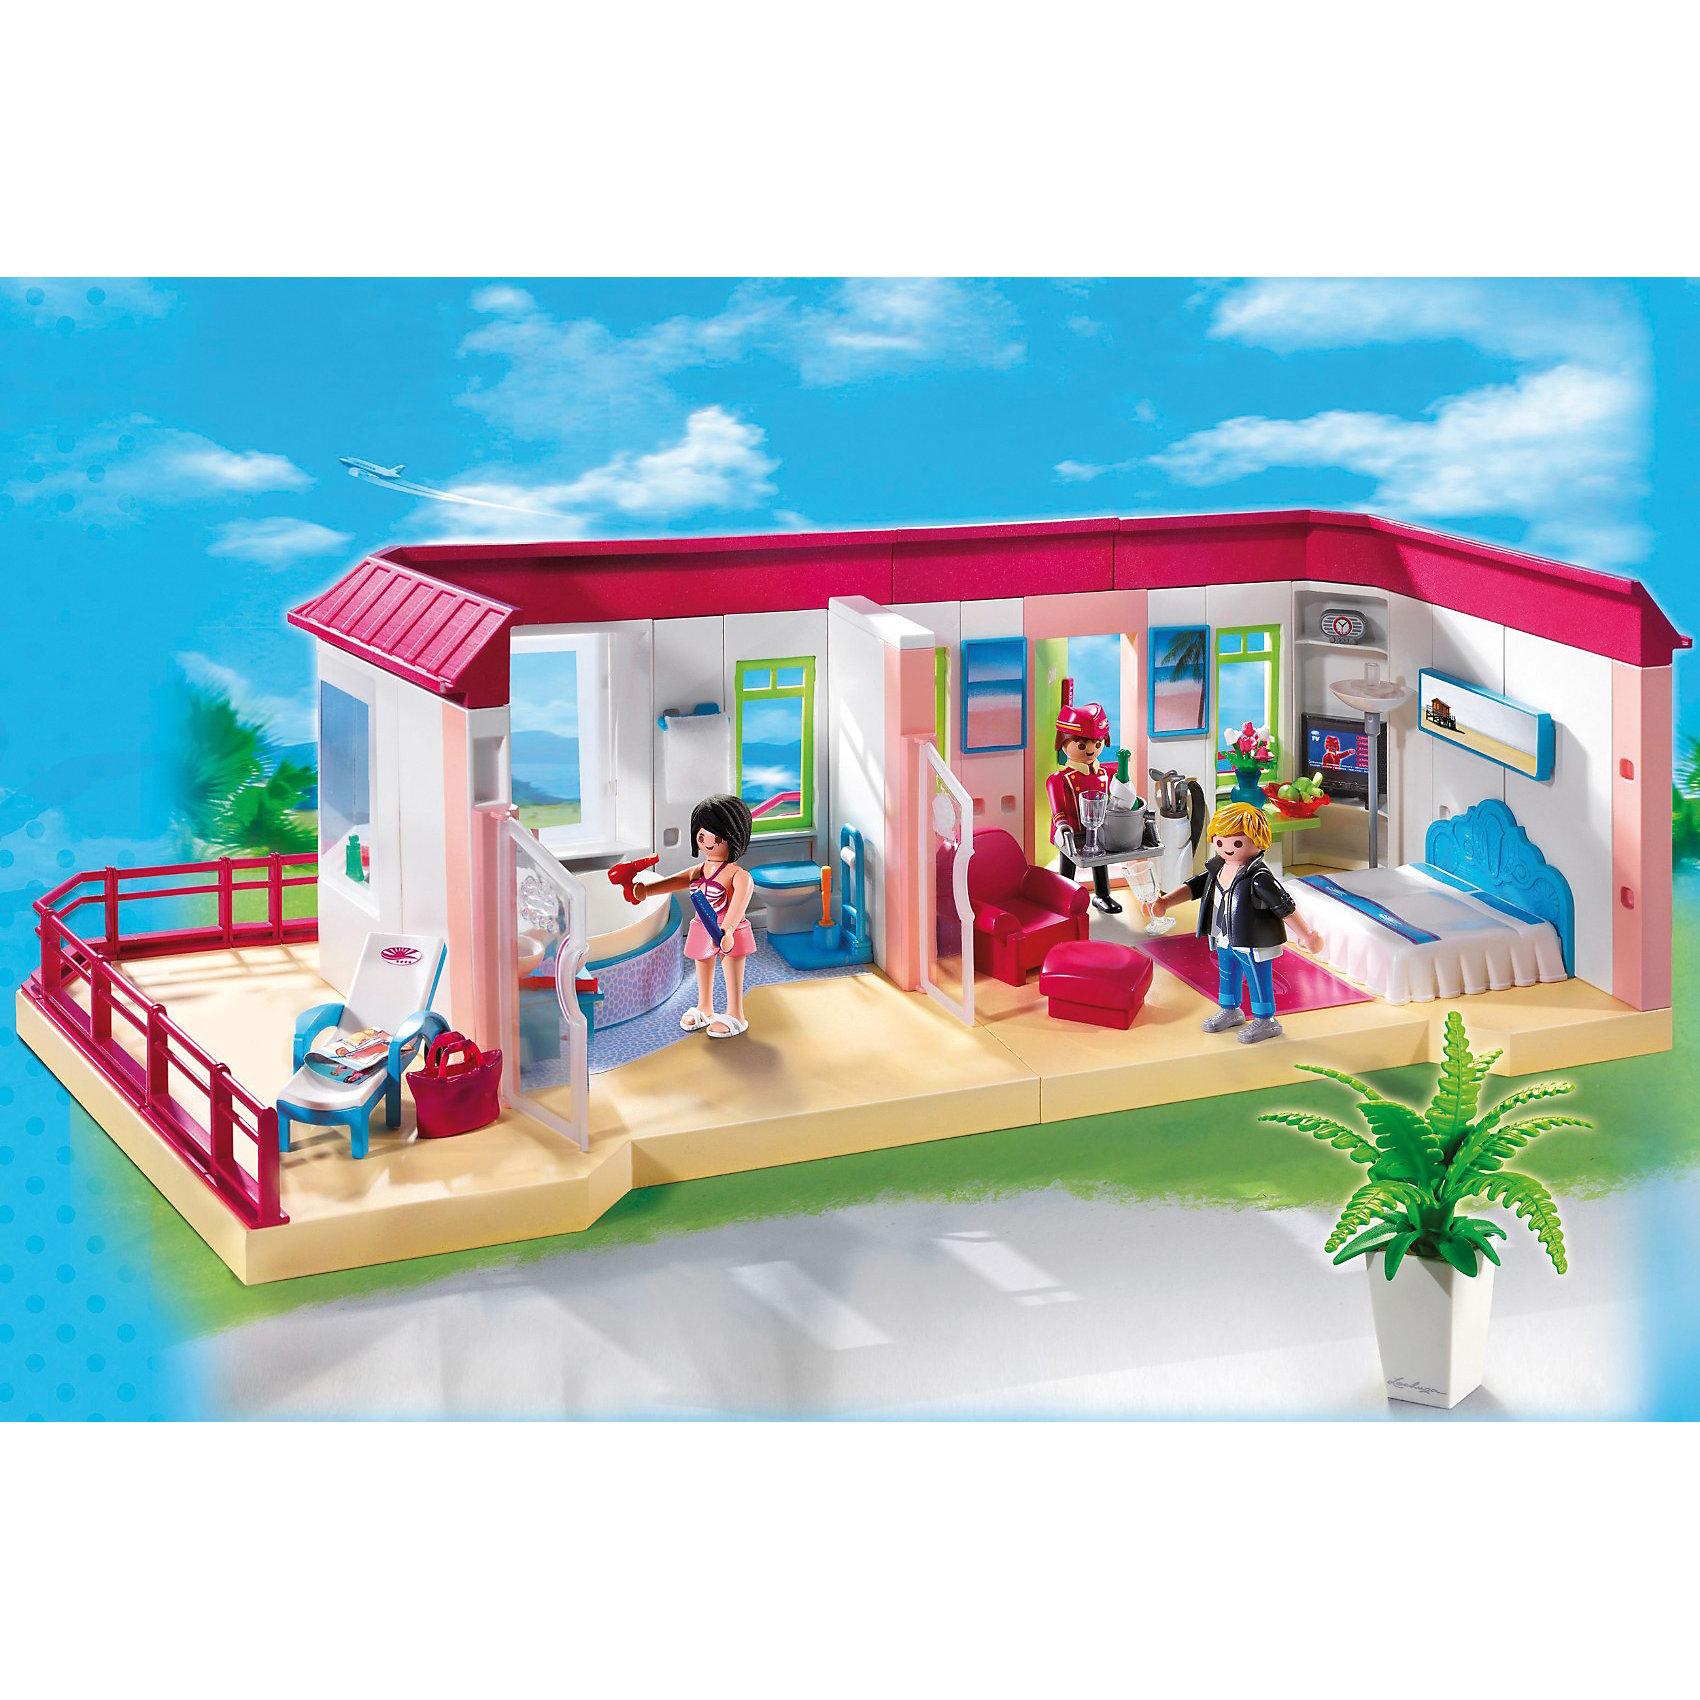 PLAYMOBIL® PLAYMOBIL5269 Отель: Номер люкс